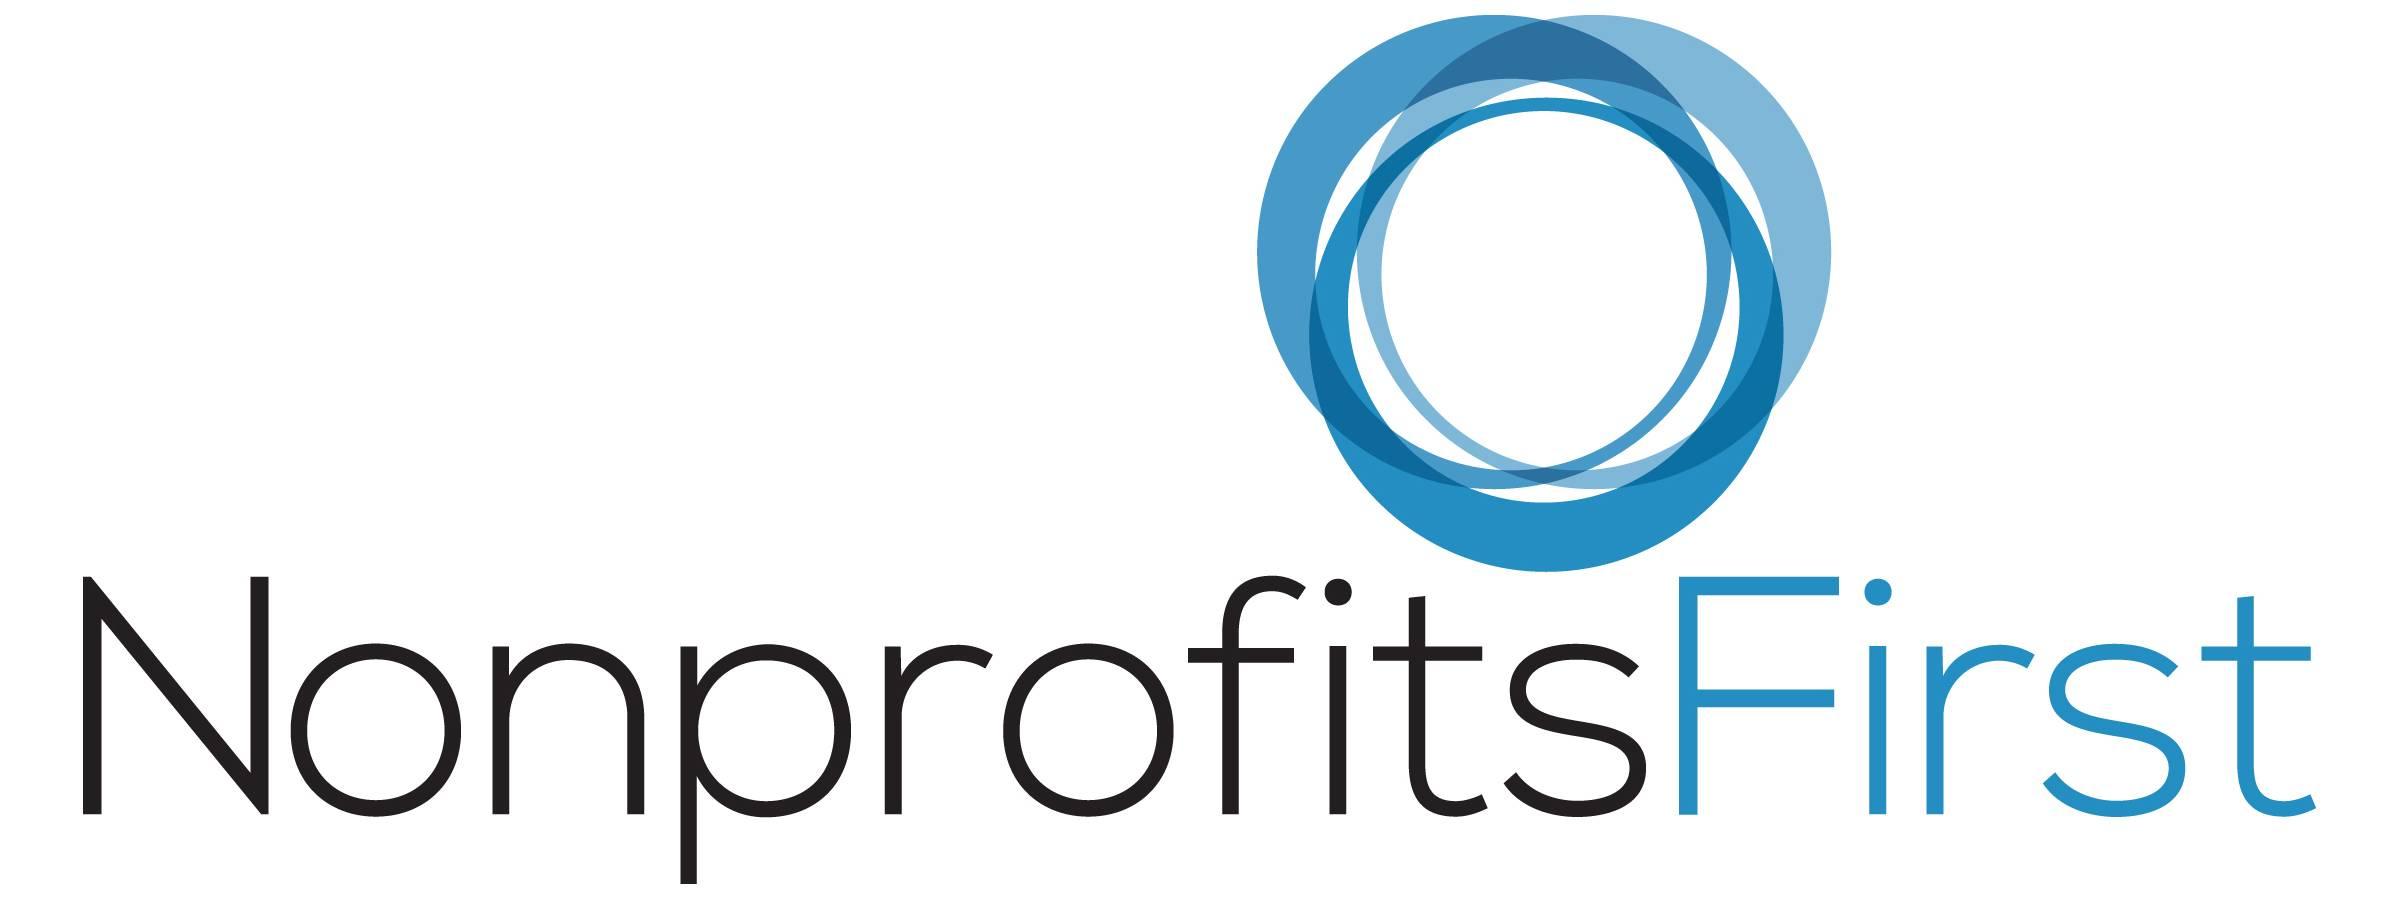 Logo of Nonprofits First, Inc.